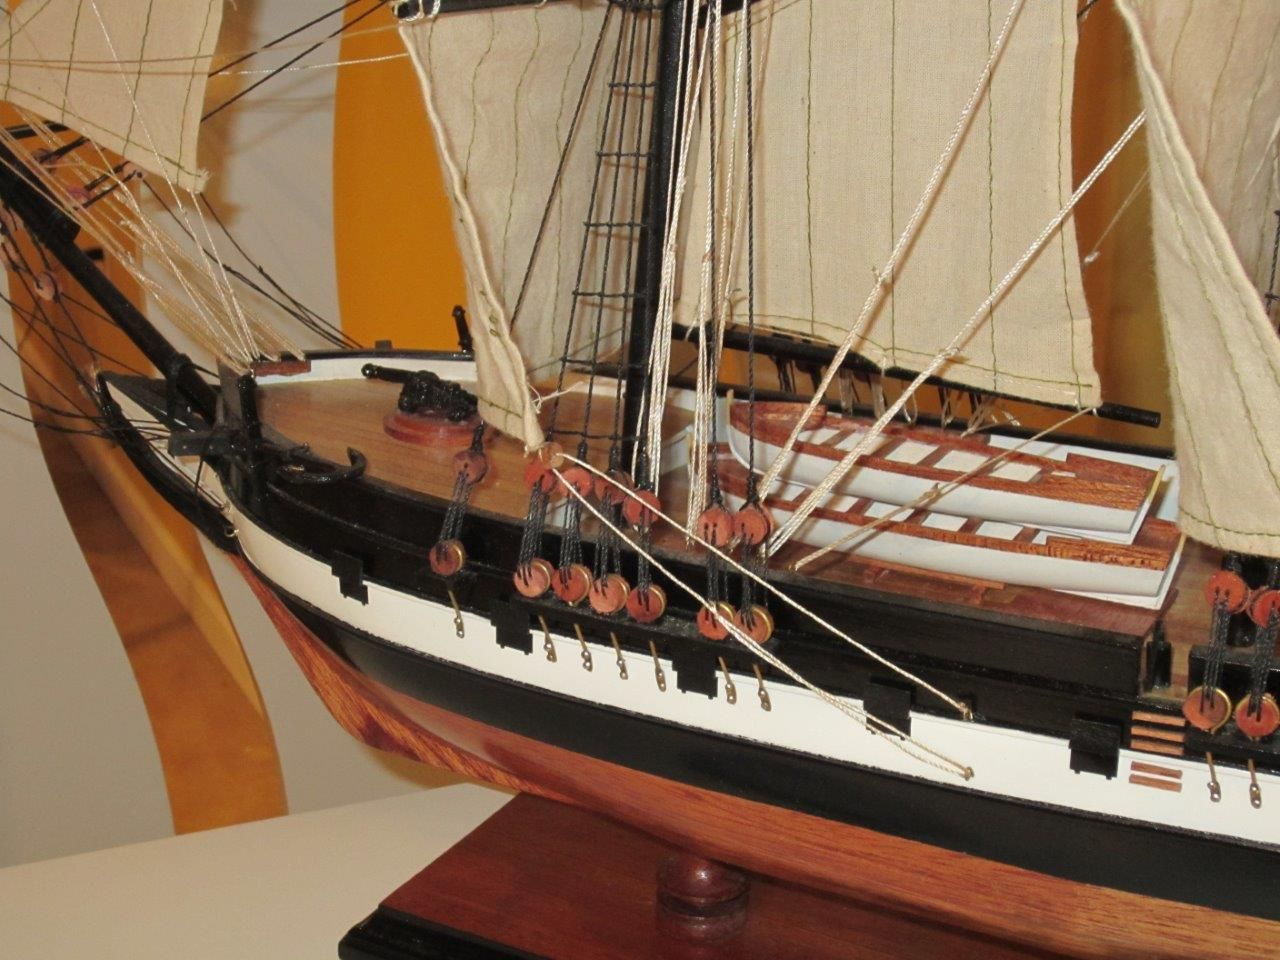 1824-10705-HMS-Beagle-Model-Ship-Standard-Range